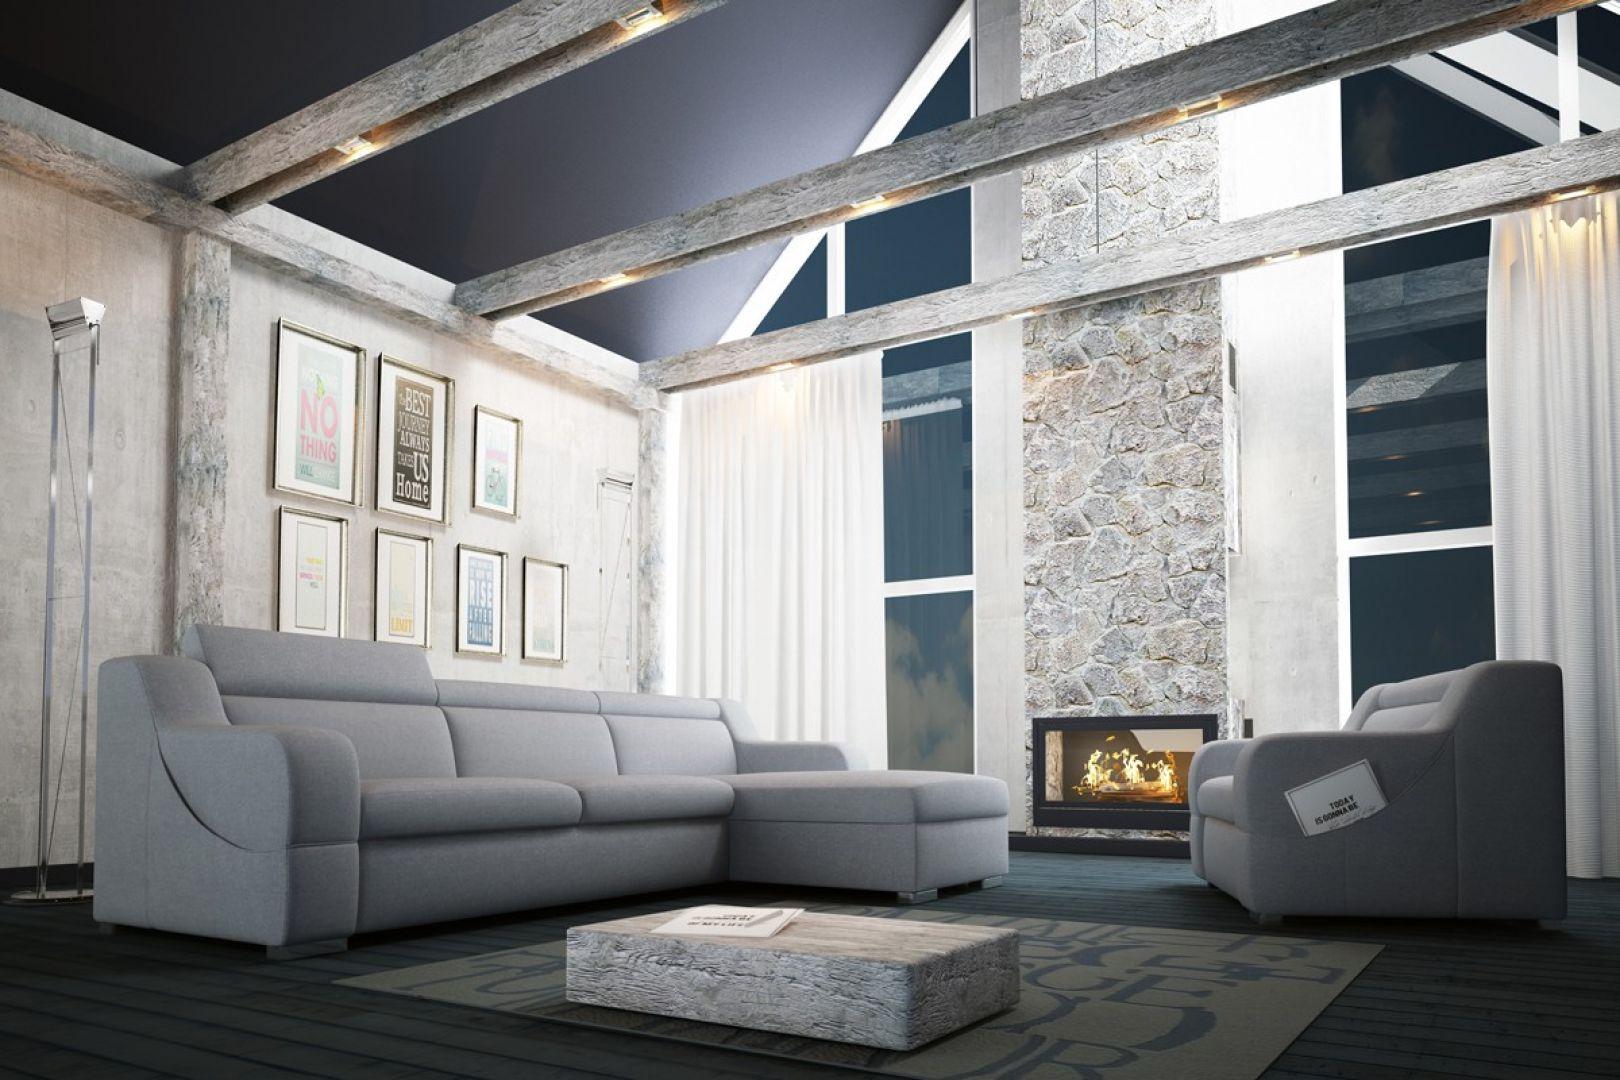 Abaco. Fot. Adriana Furniture